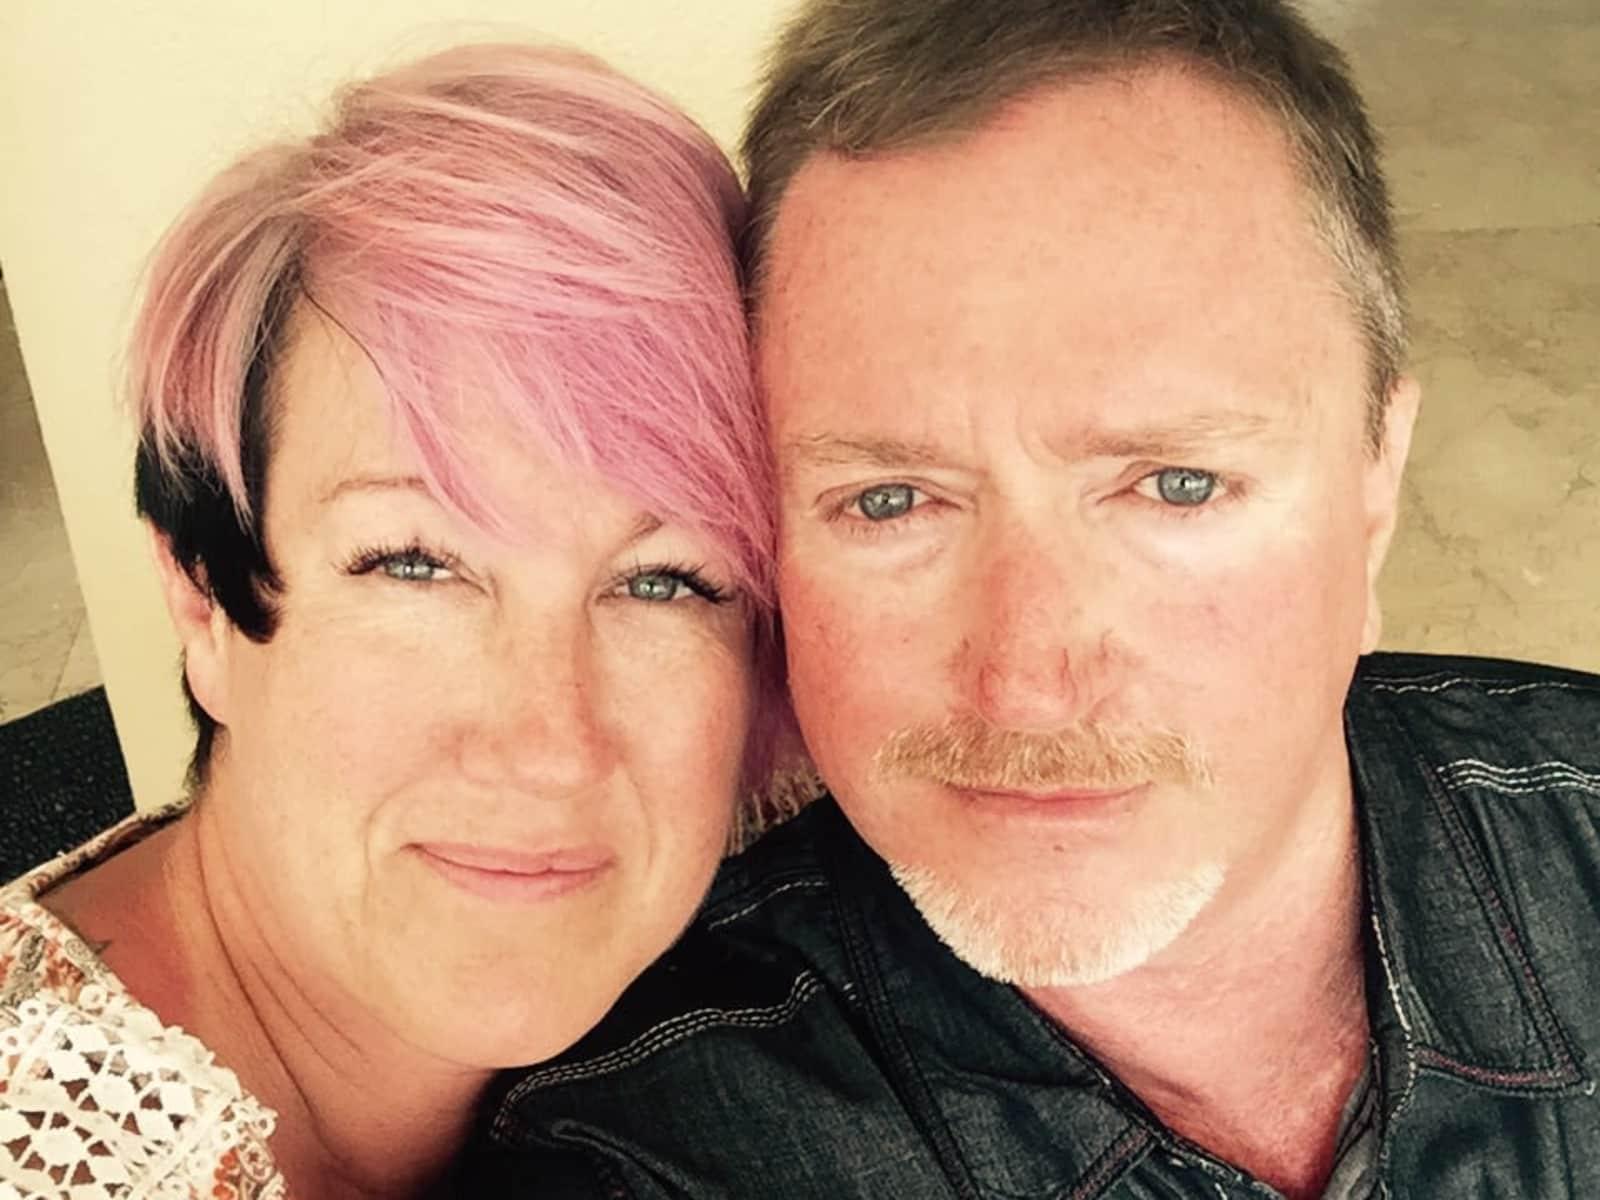 Debbie & Sean from Nanaimo, British Columbia, Canada